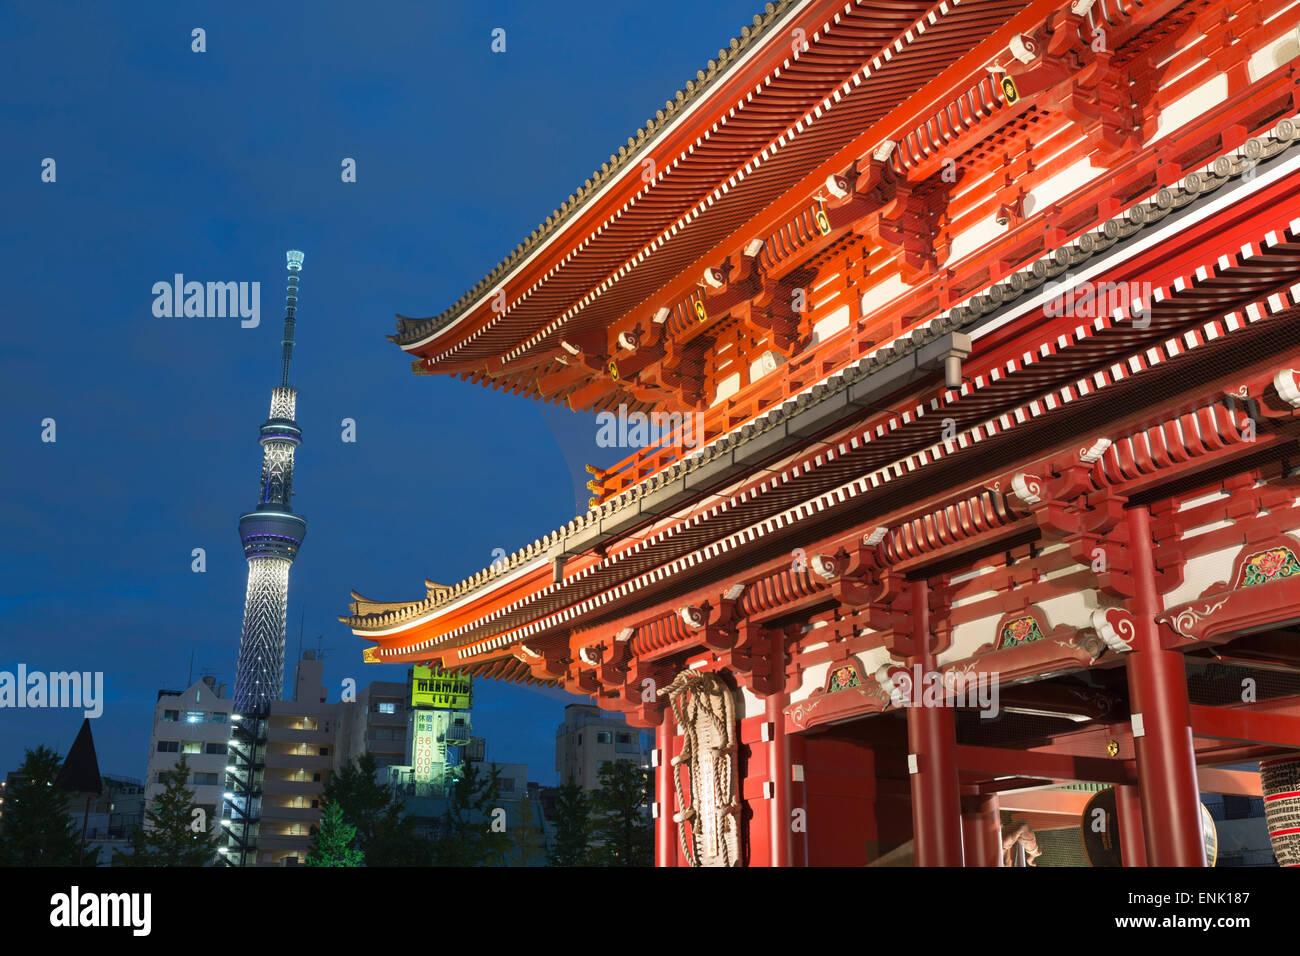 Senso-Ji Tempel und Skytree Turm bei Nacht, Asakusa, Tokio, Japan, Asien Stockbild